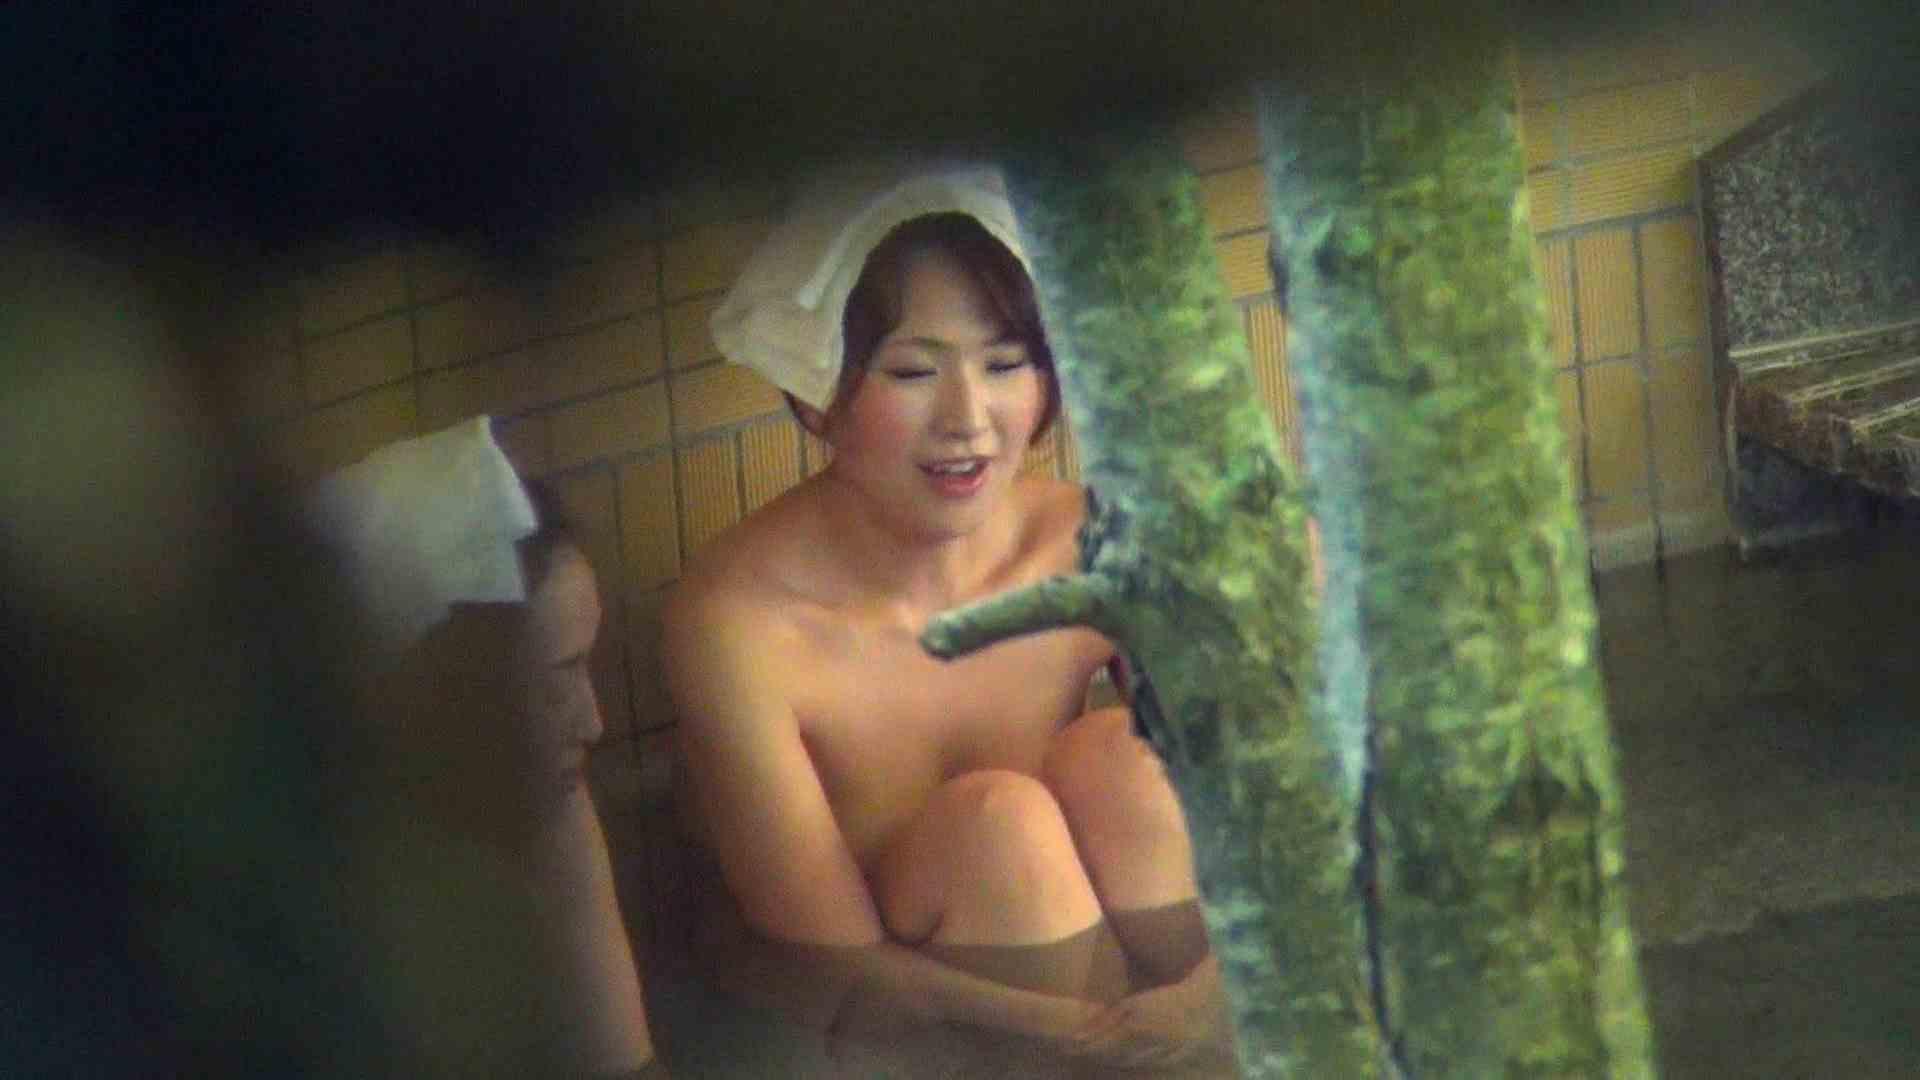 Aquaな露天風呂Vol.272 0  75連発 8